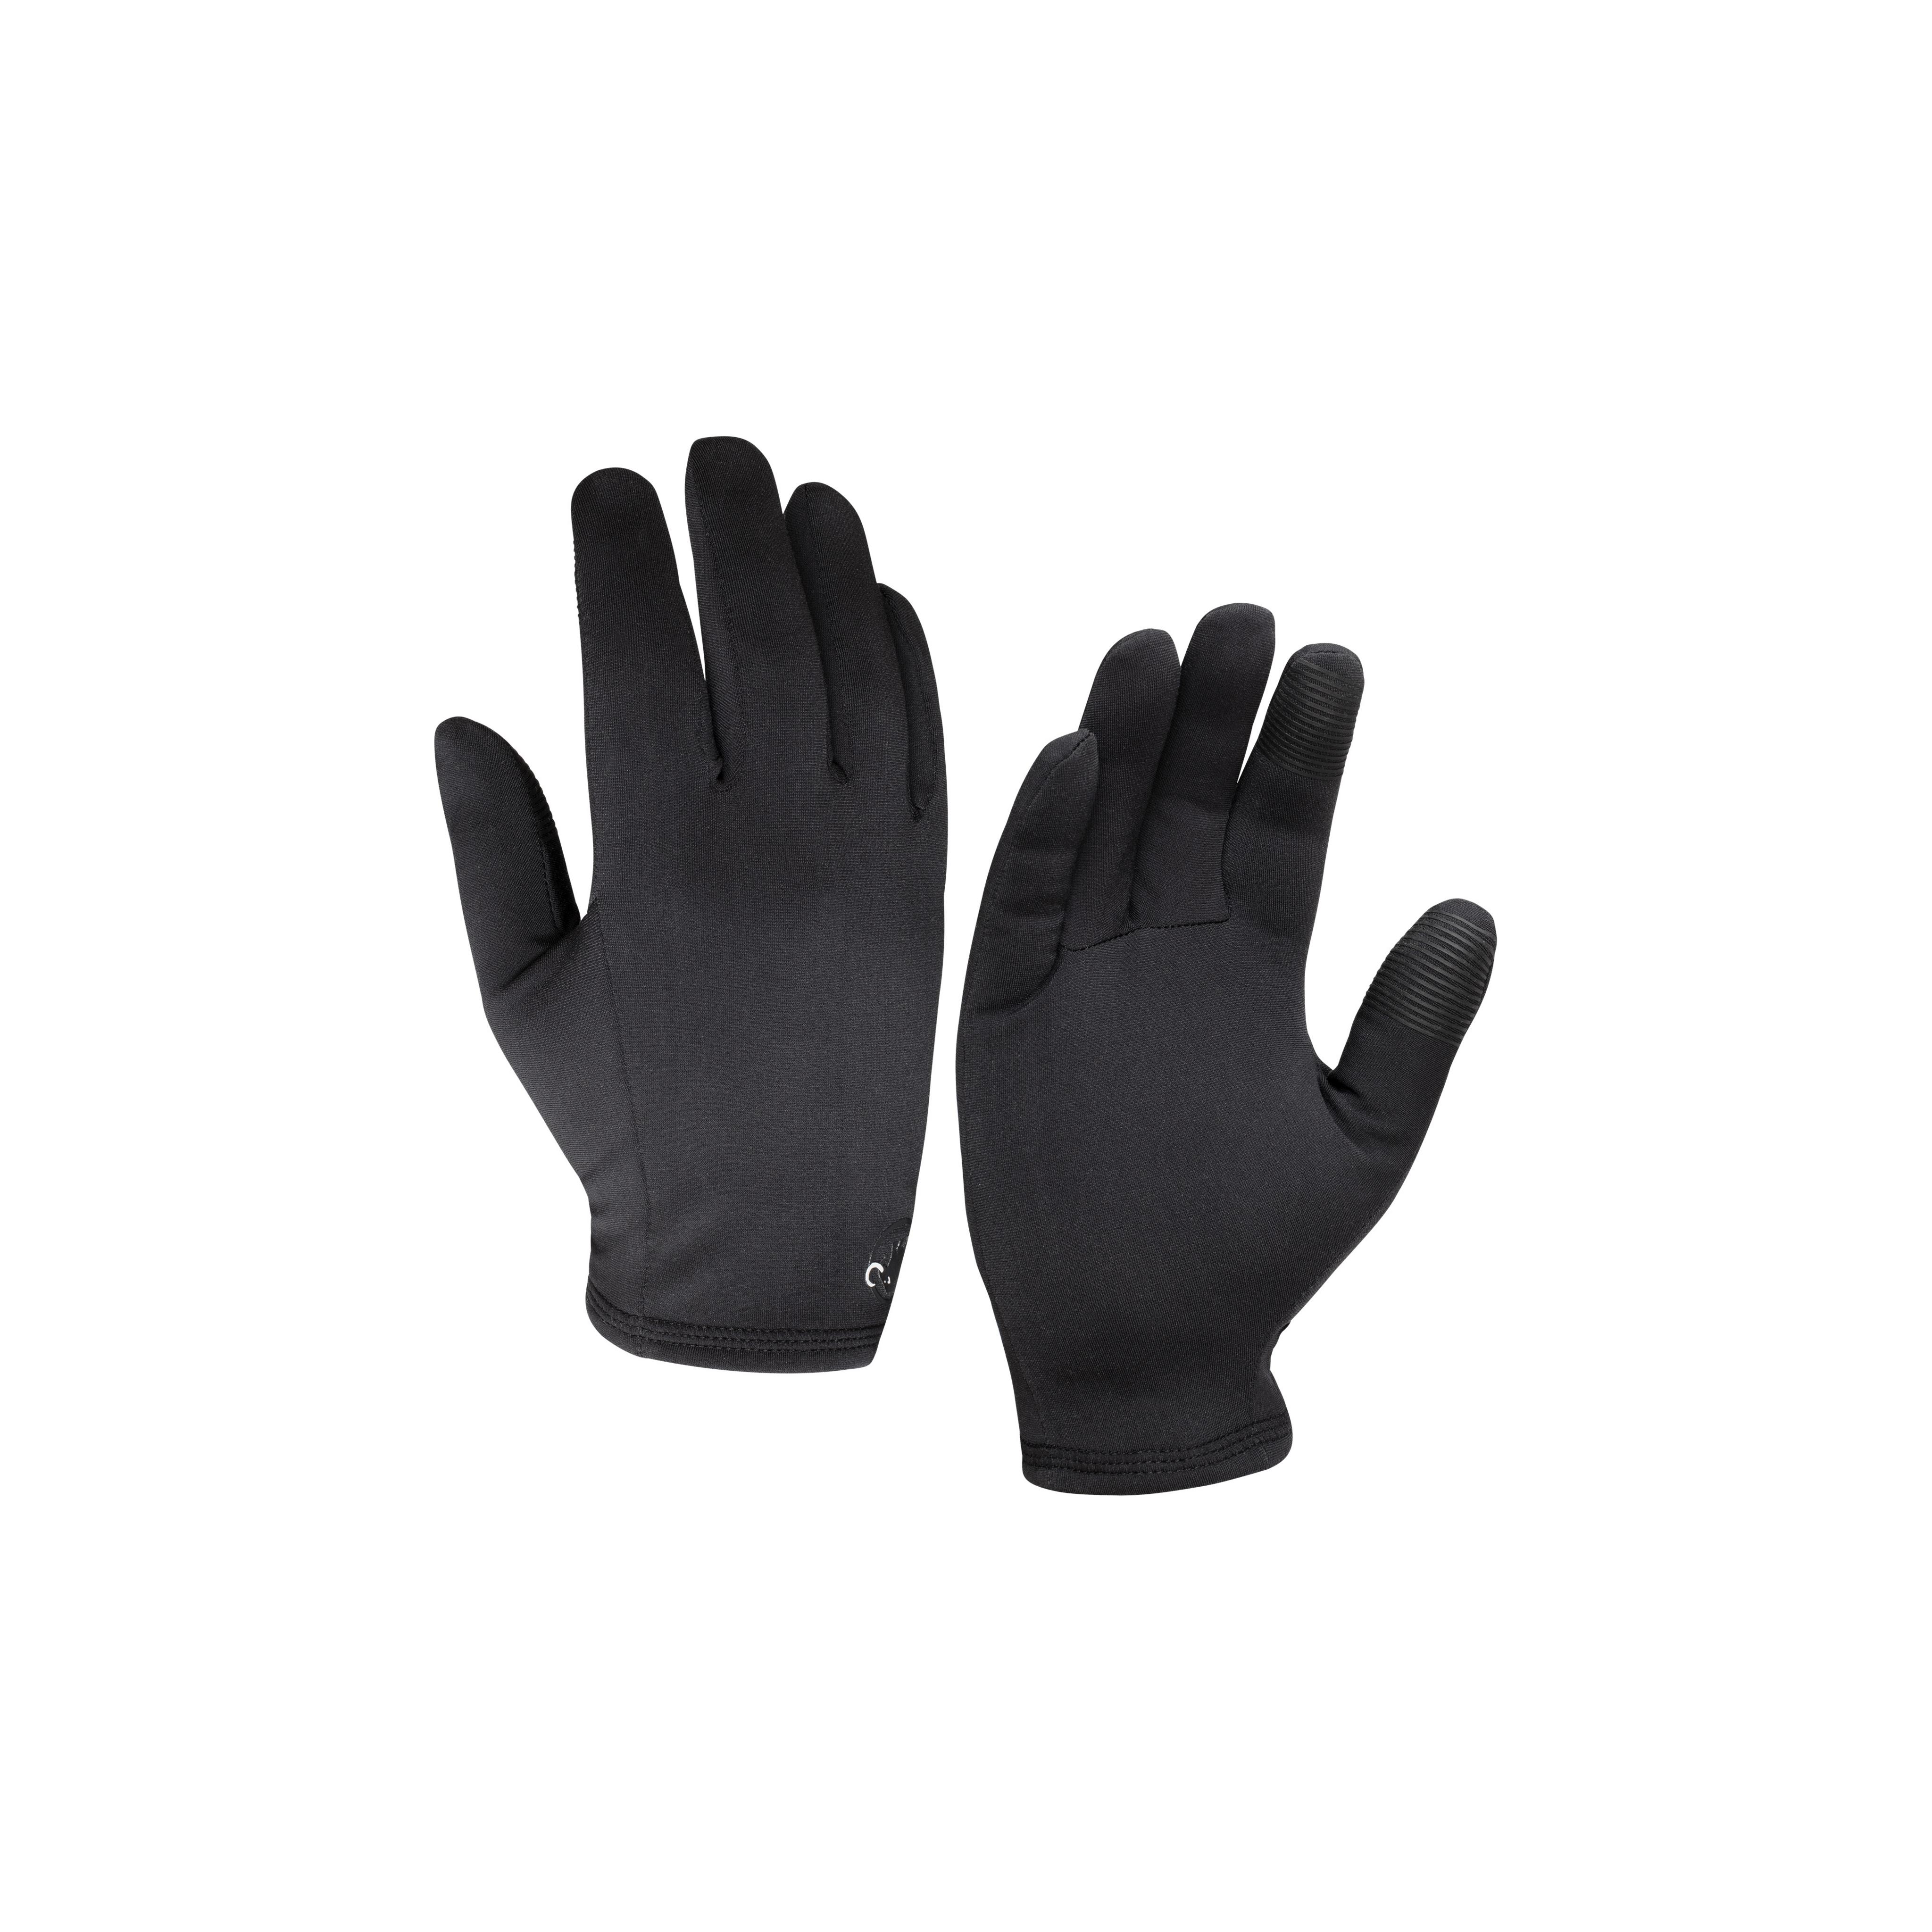 Stretch Glove - 5, black thumbnail